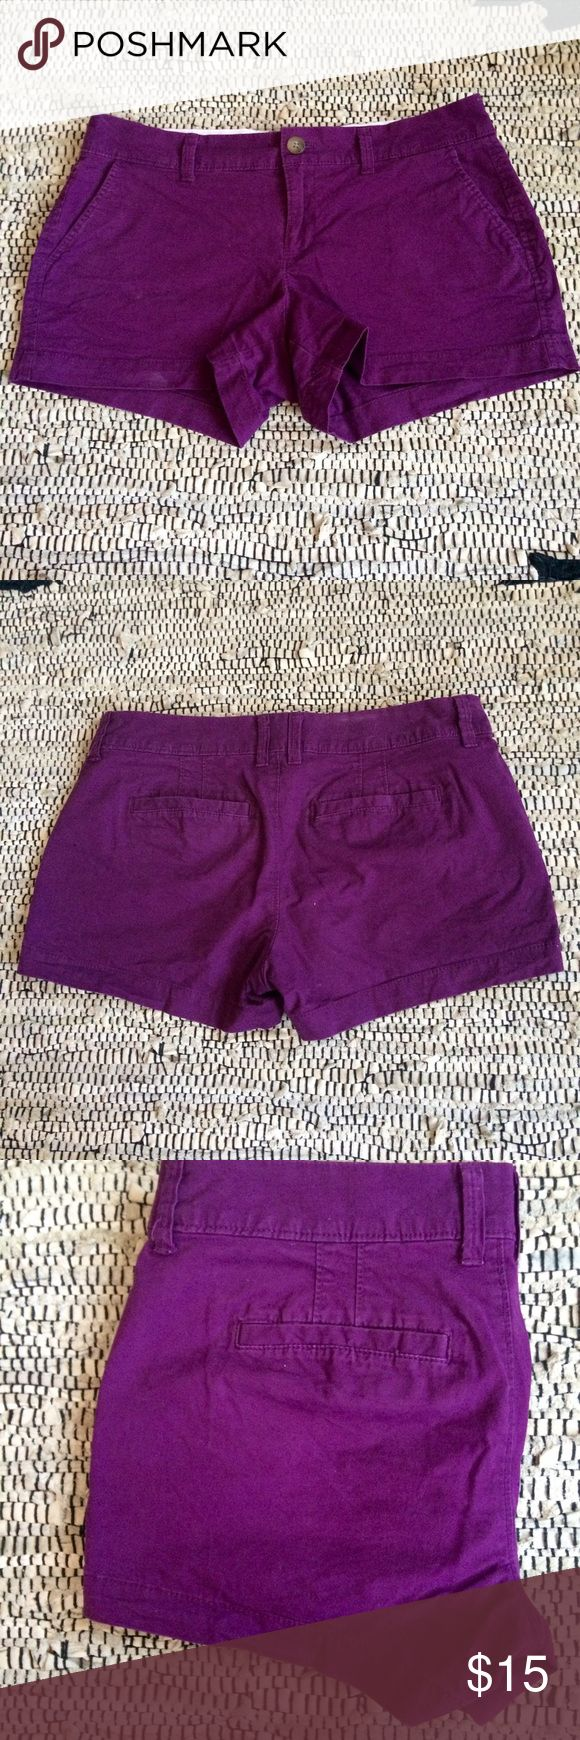 Old Navy purple chino shorts Plum/Eggplant/Dark purple shorts from old navy. Size 2 Old Navy Shorts